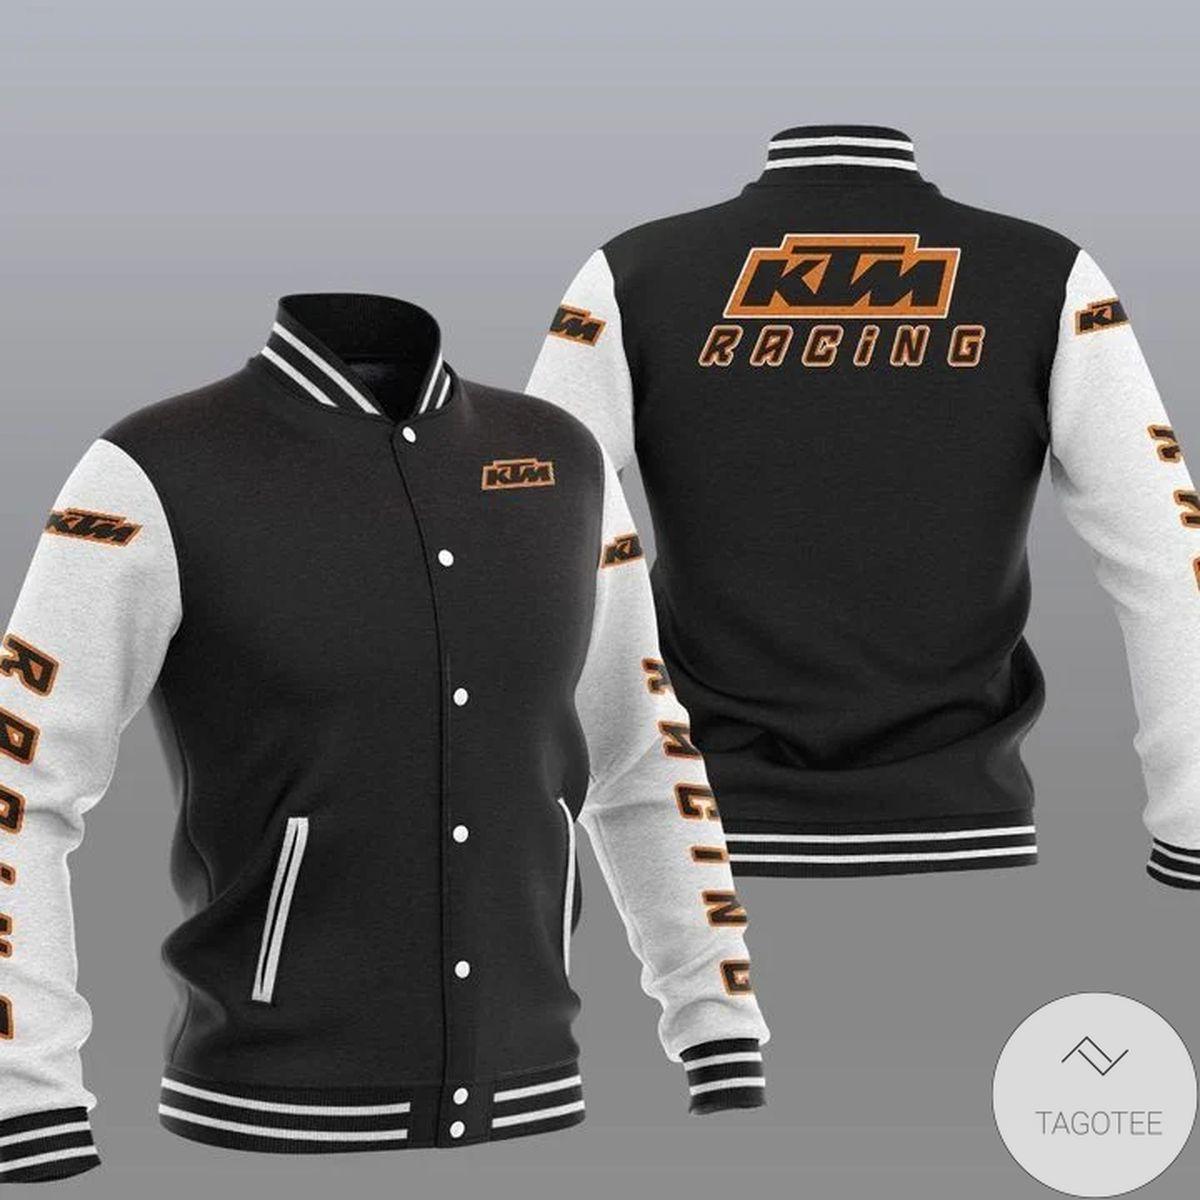 Ktm Racing Varsity Baseball Jacket